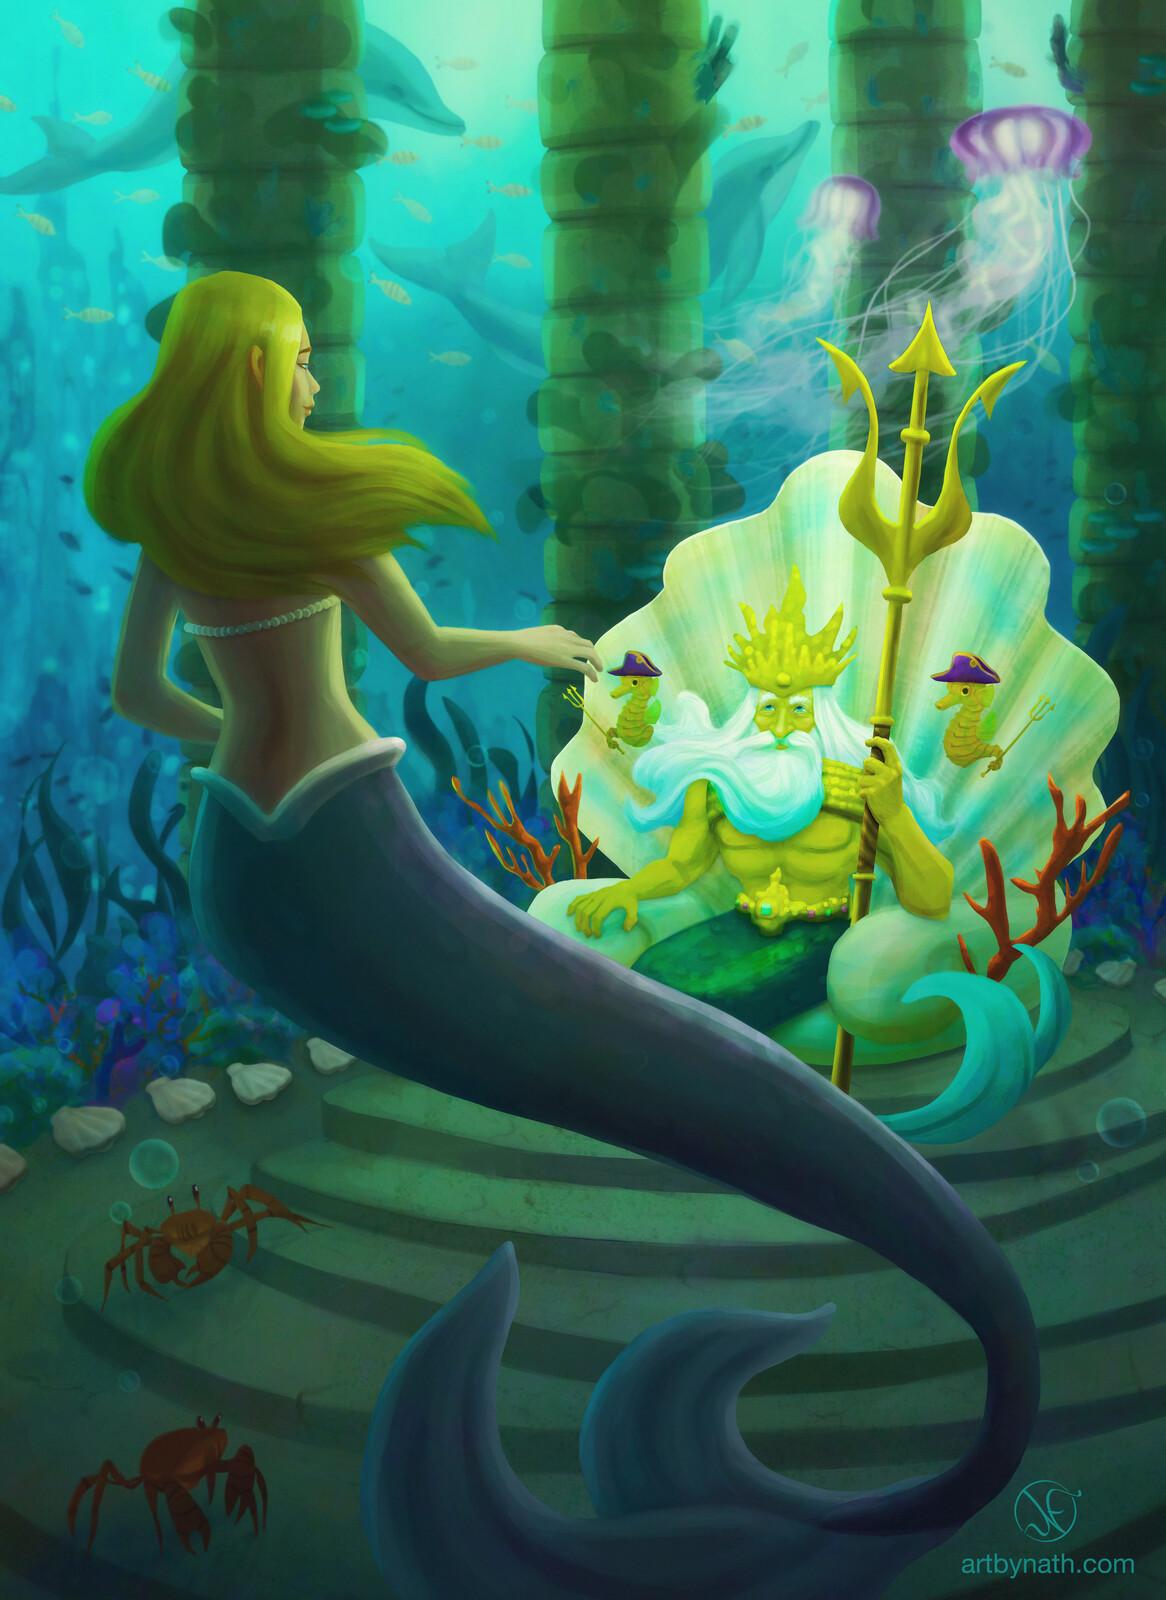 The Little Mermaid Book Illustration